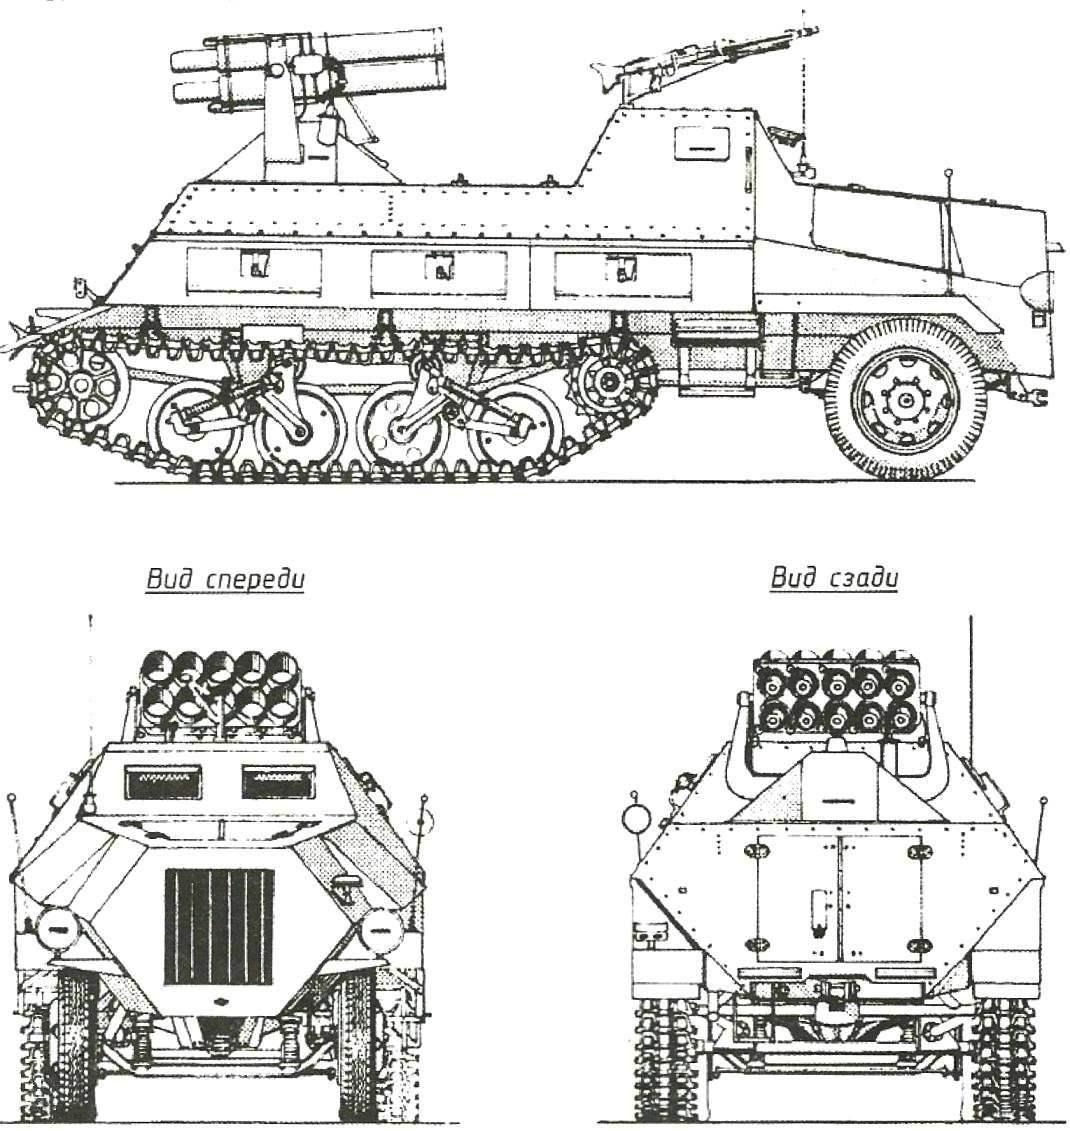 15 cm Panzerwerfer 42 auf Sf с трубчатыми направляющими